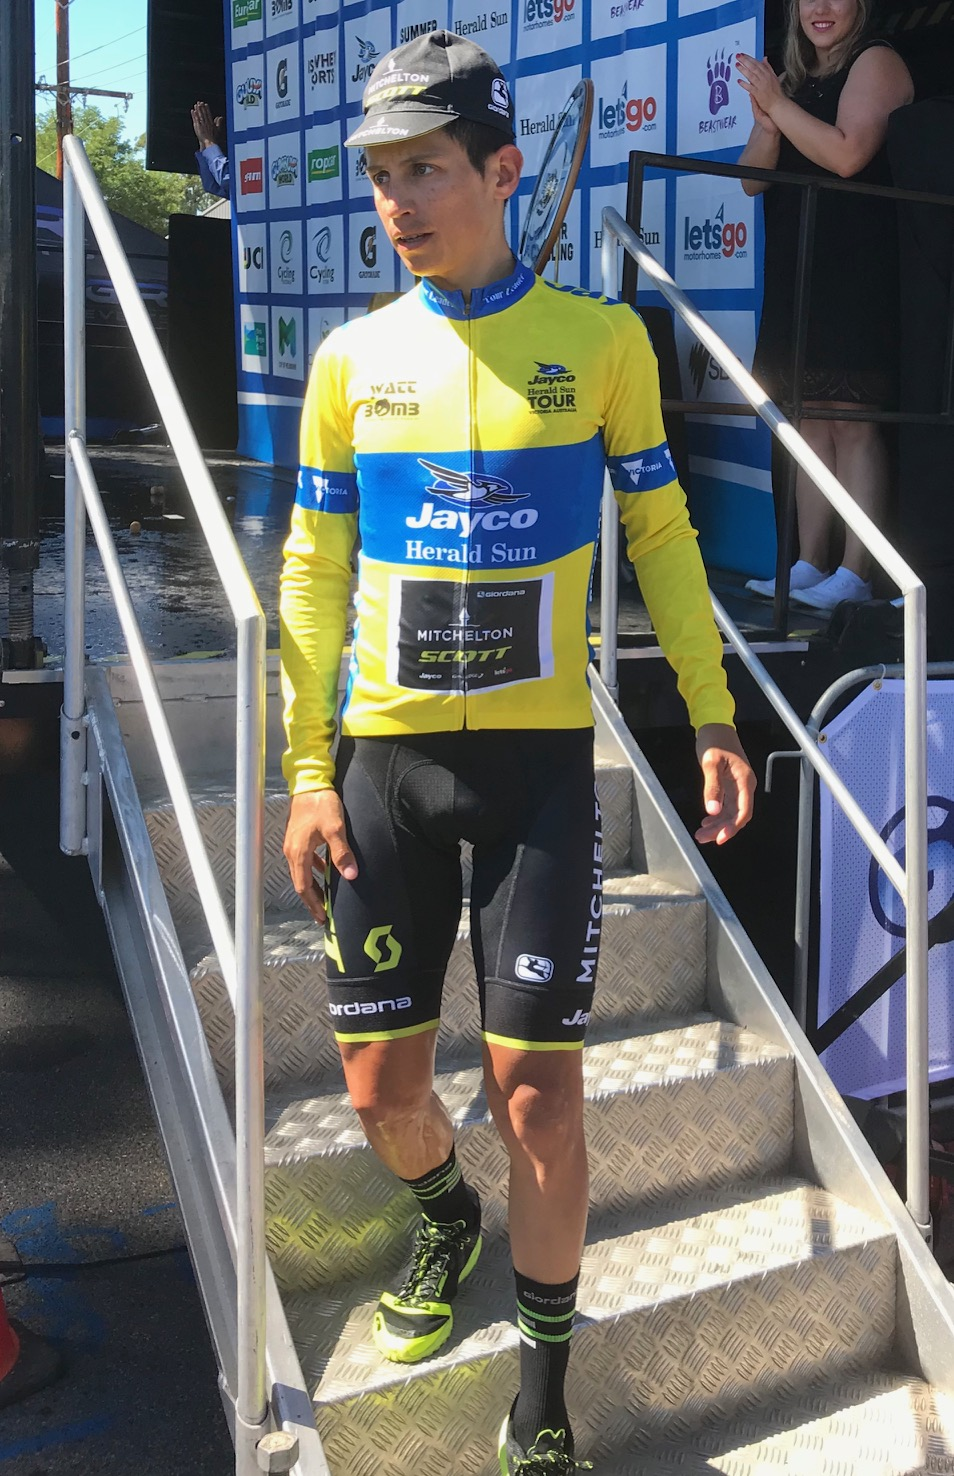 Herald Sun Tour 18 - Esteban Chaves was a hugely popular winner at Kinglake (photo MOR)